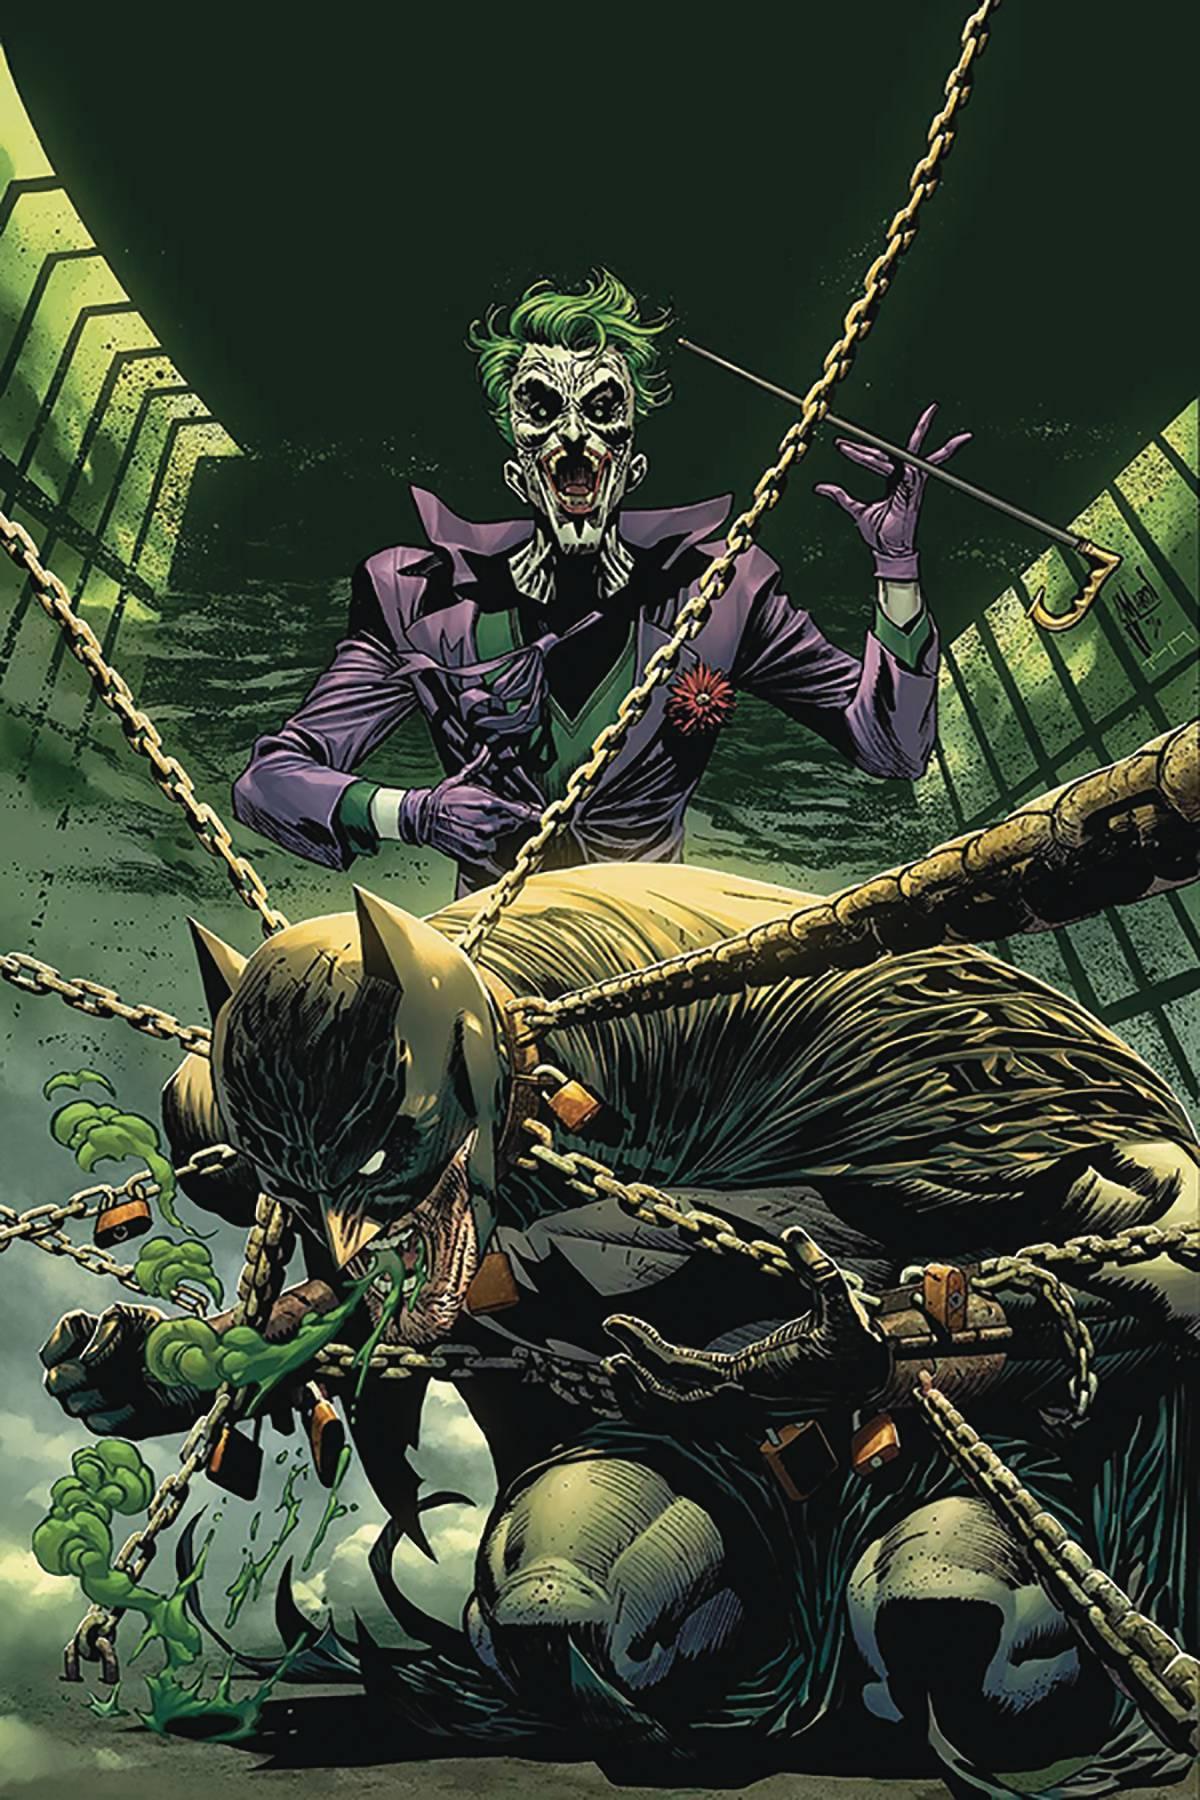 BATMAN #97 JOKER WAR TYNION IV SGN